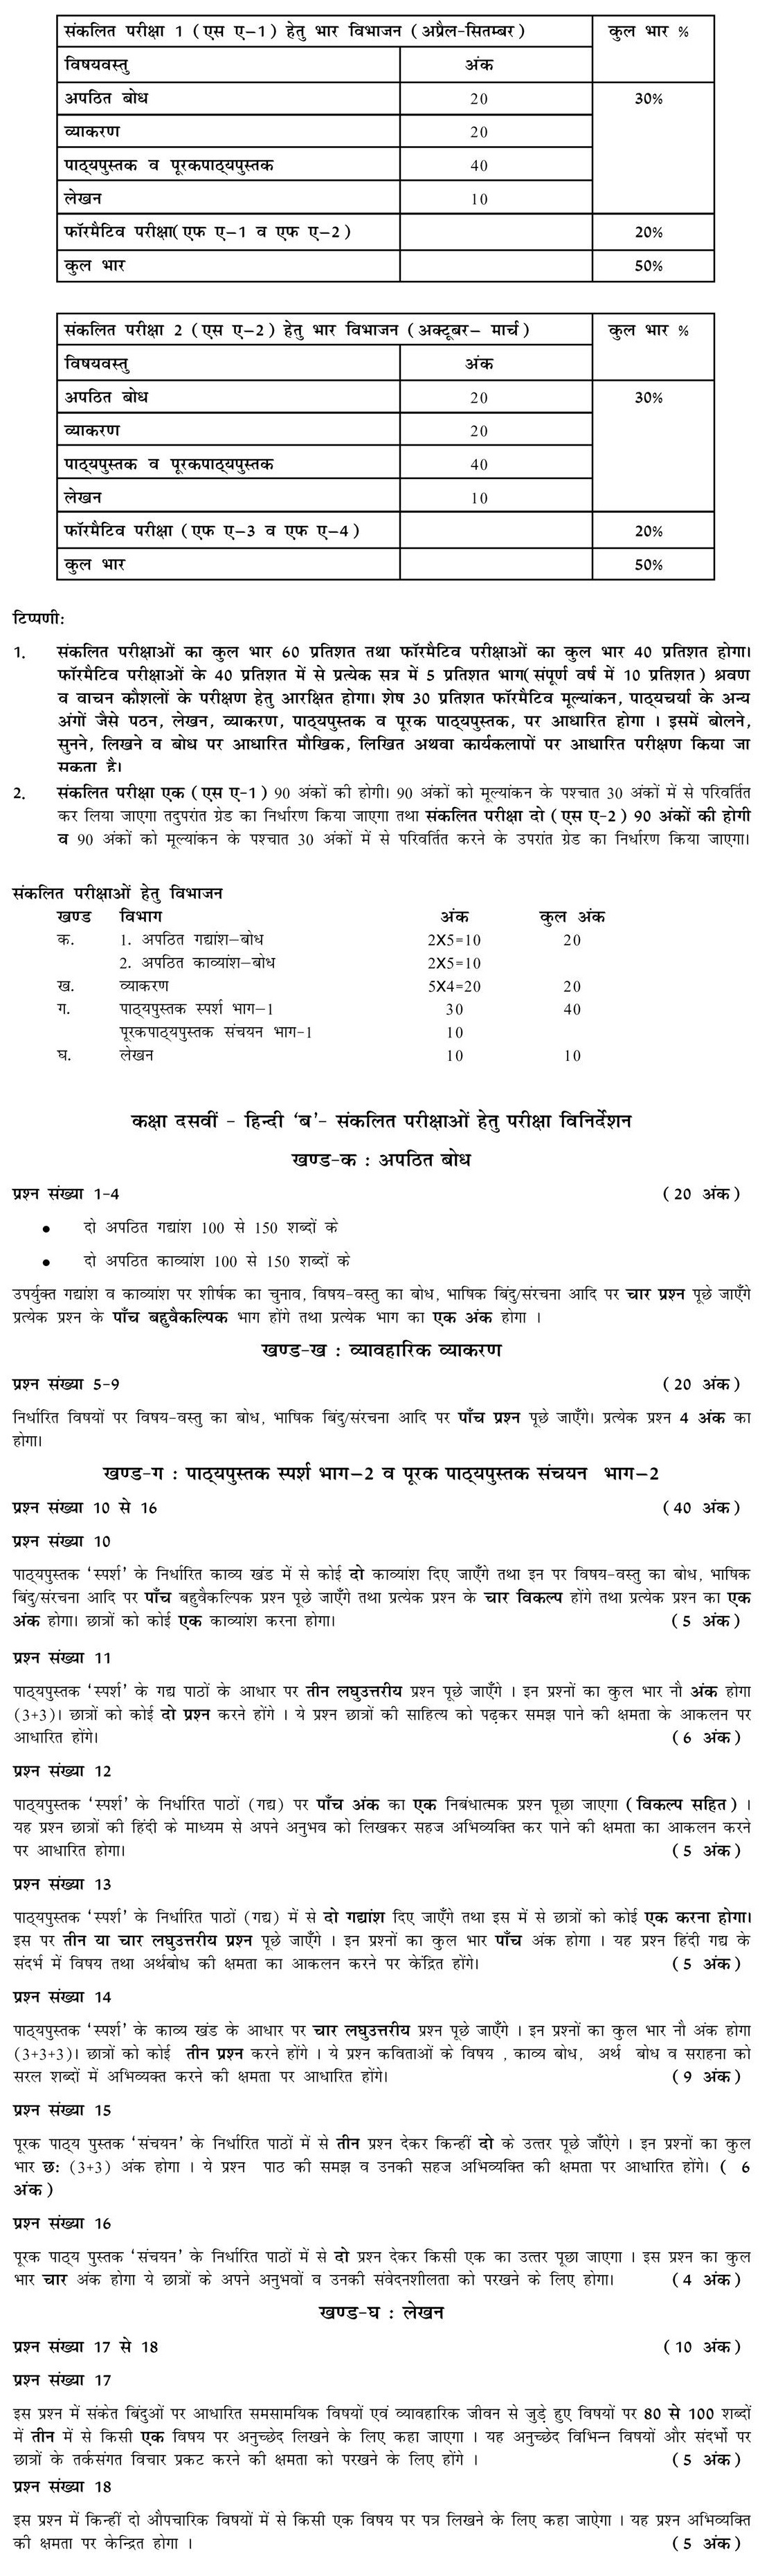 CBSE Class X Marking Scheme 2014 Hindi B